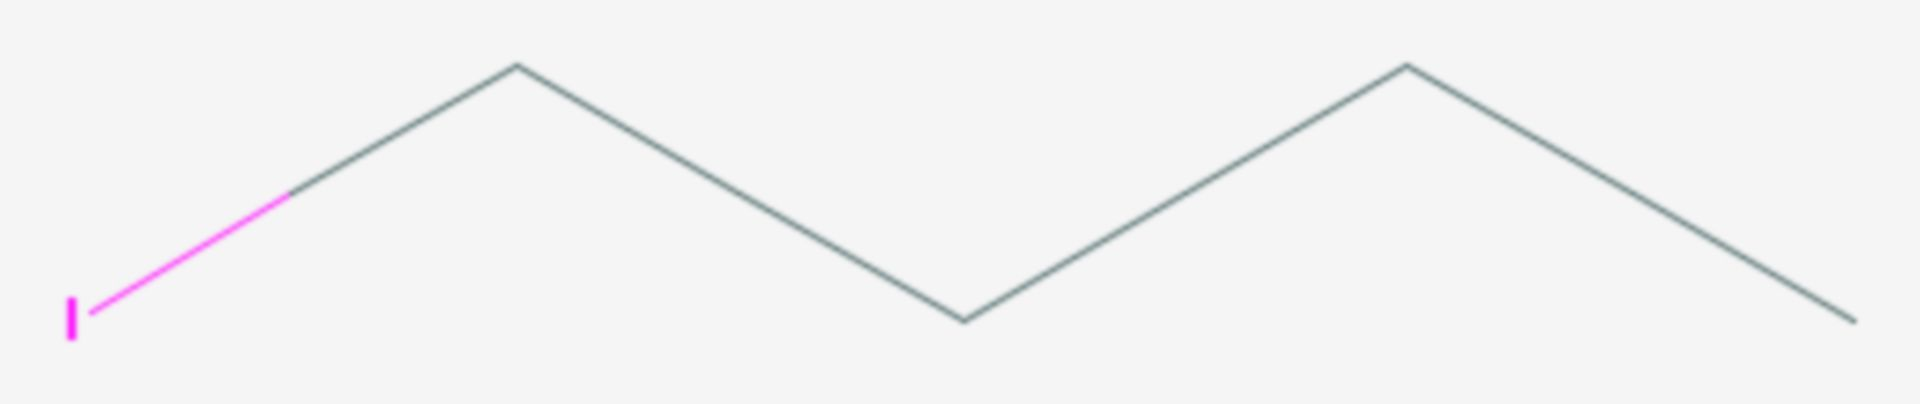 1-Iodbutan (Strukturformel)